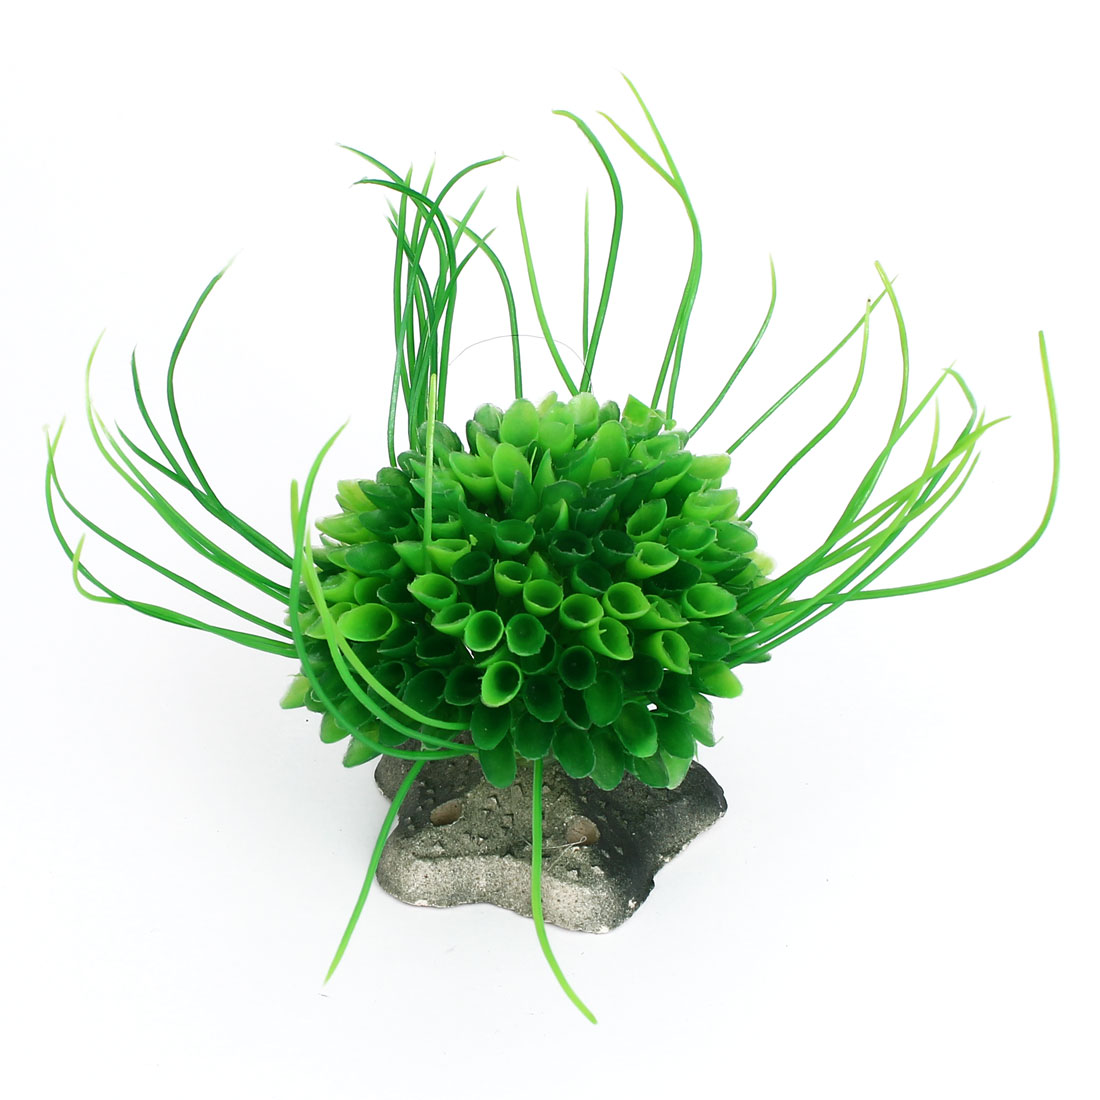 Aquarium Fish Tank Bowl Star Base Plastic Plant Bouquet Decor Ornament Green